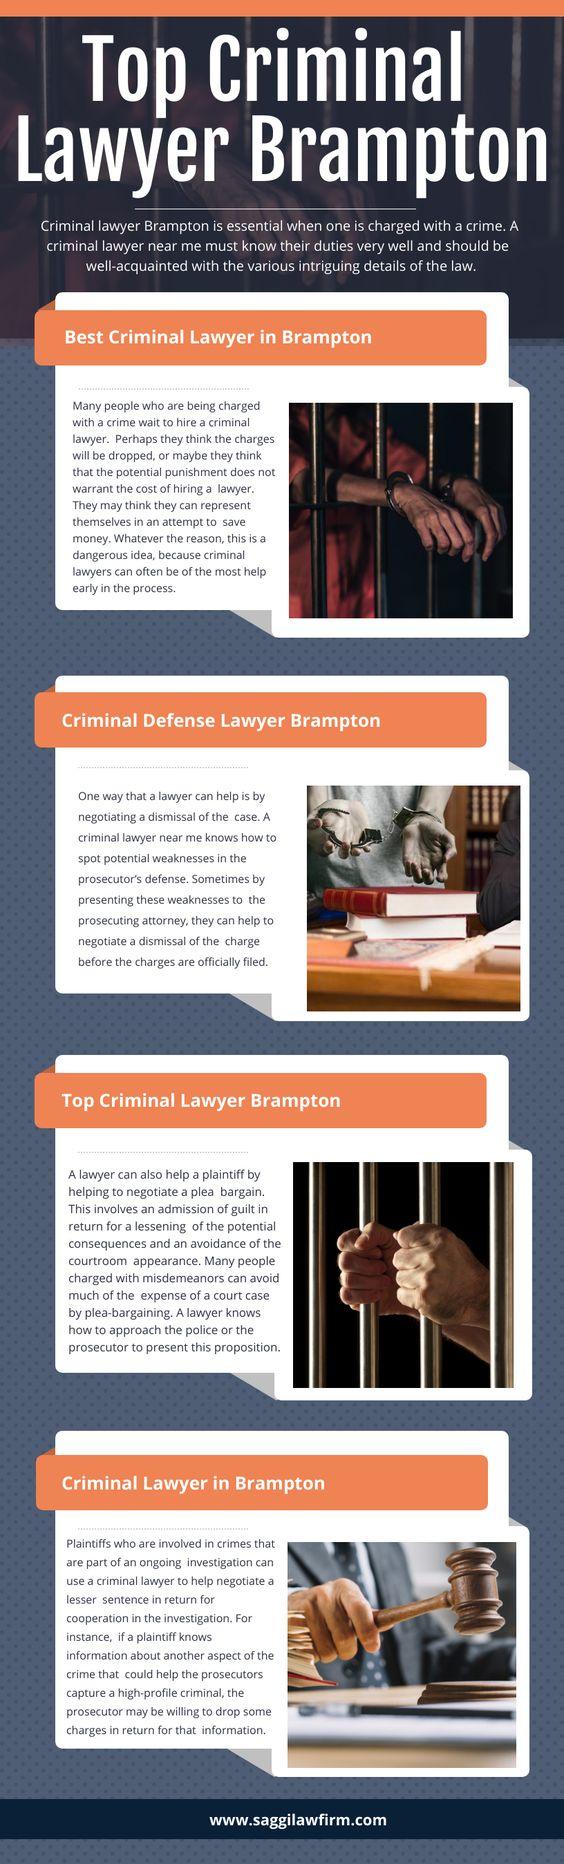 Top Criminal Lawyer Brampton